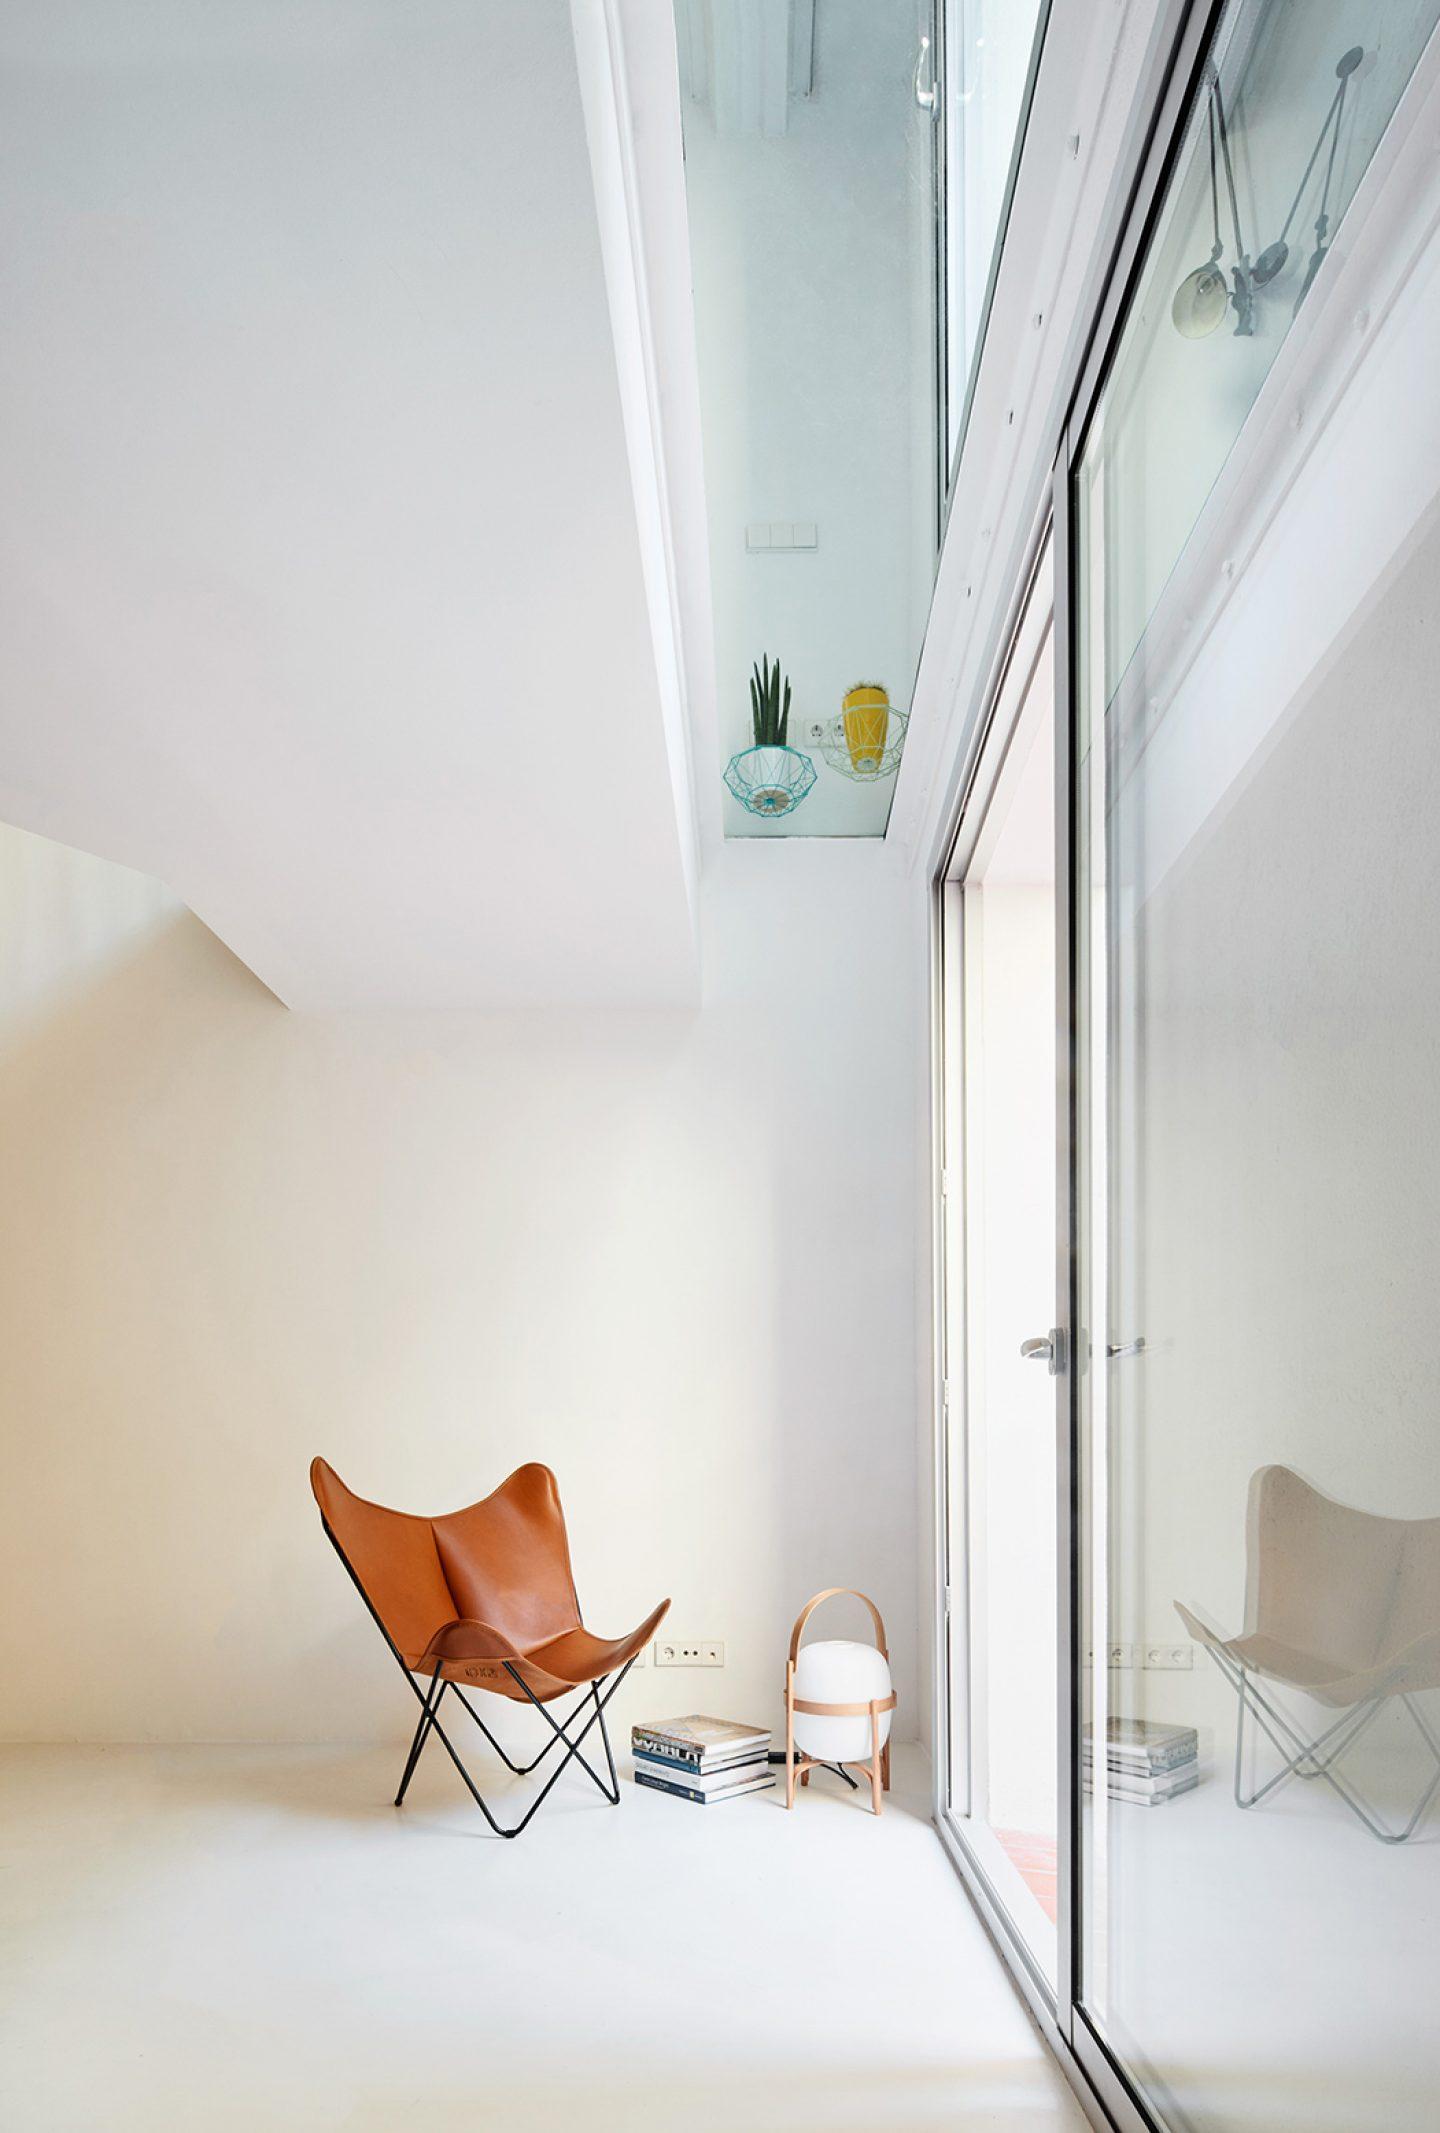 iGNANT_Architecture_Duplex_Tibbaut_Raul_Sanchez_3